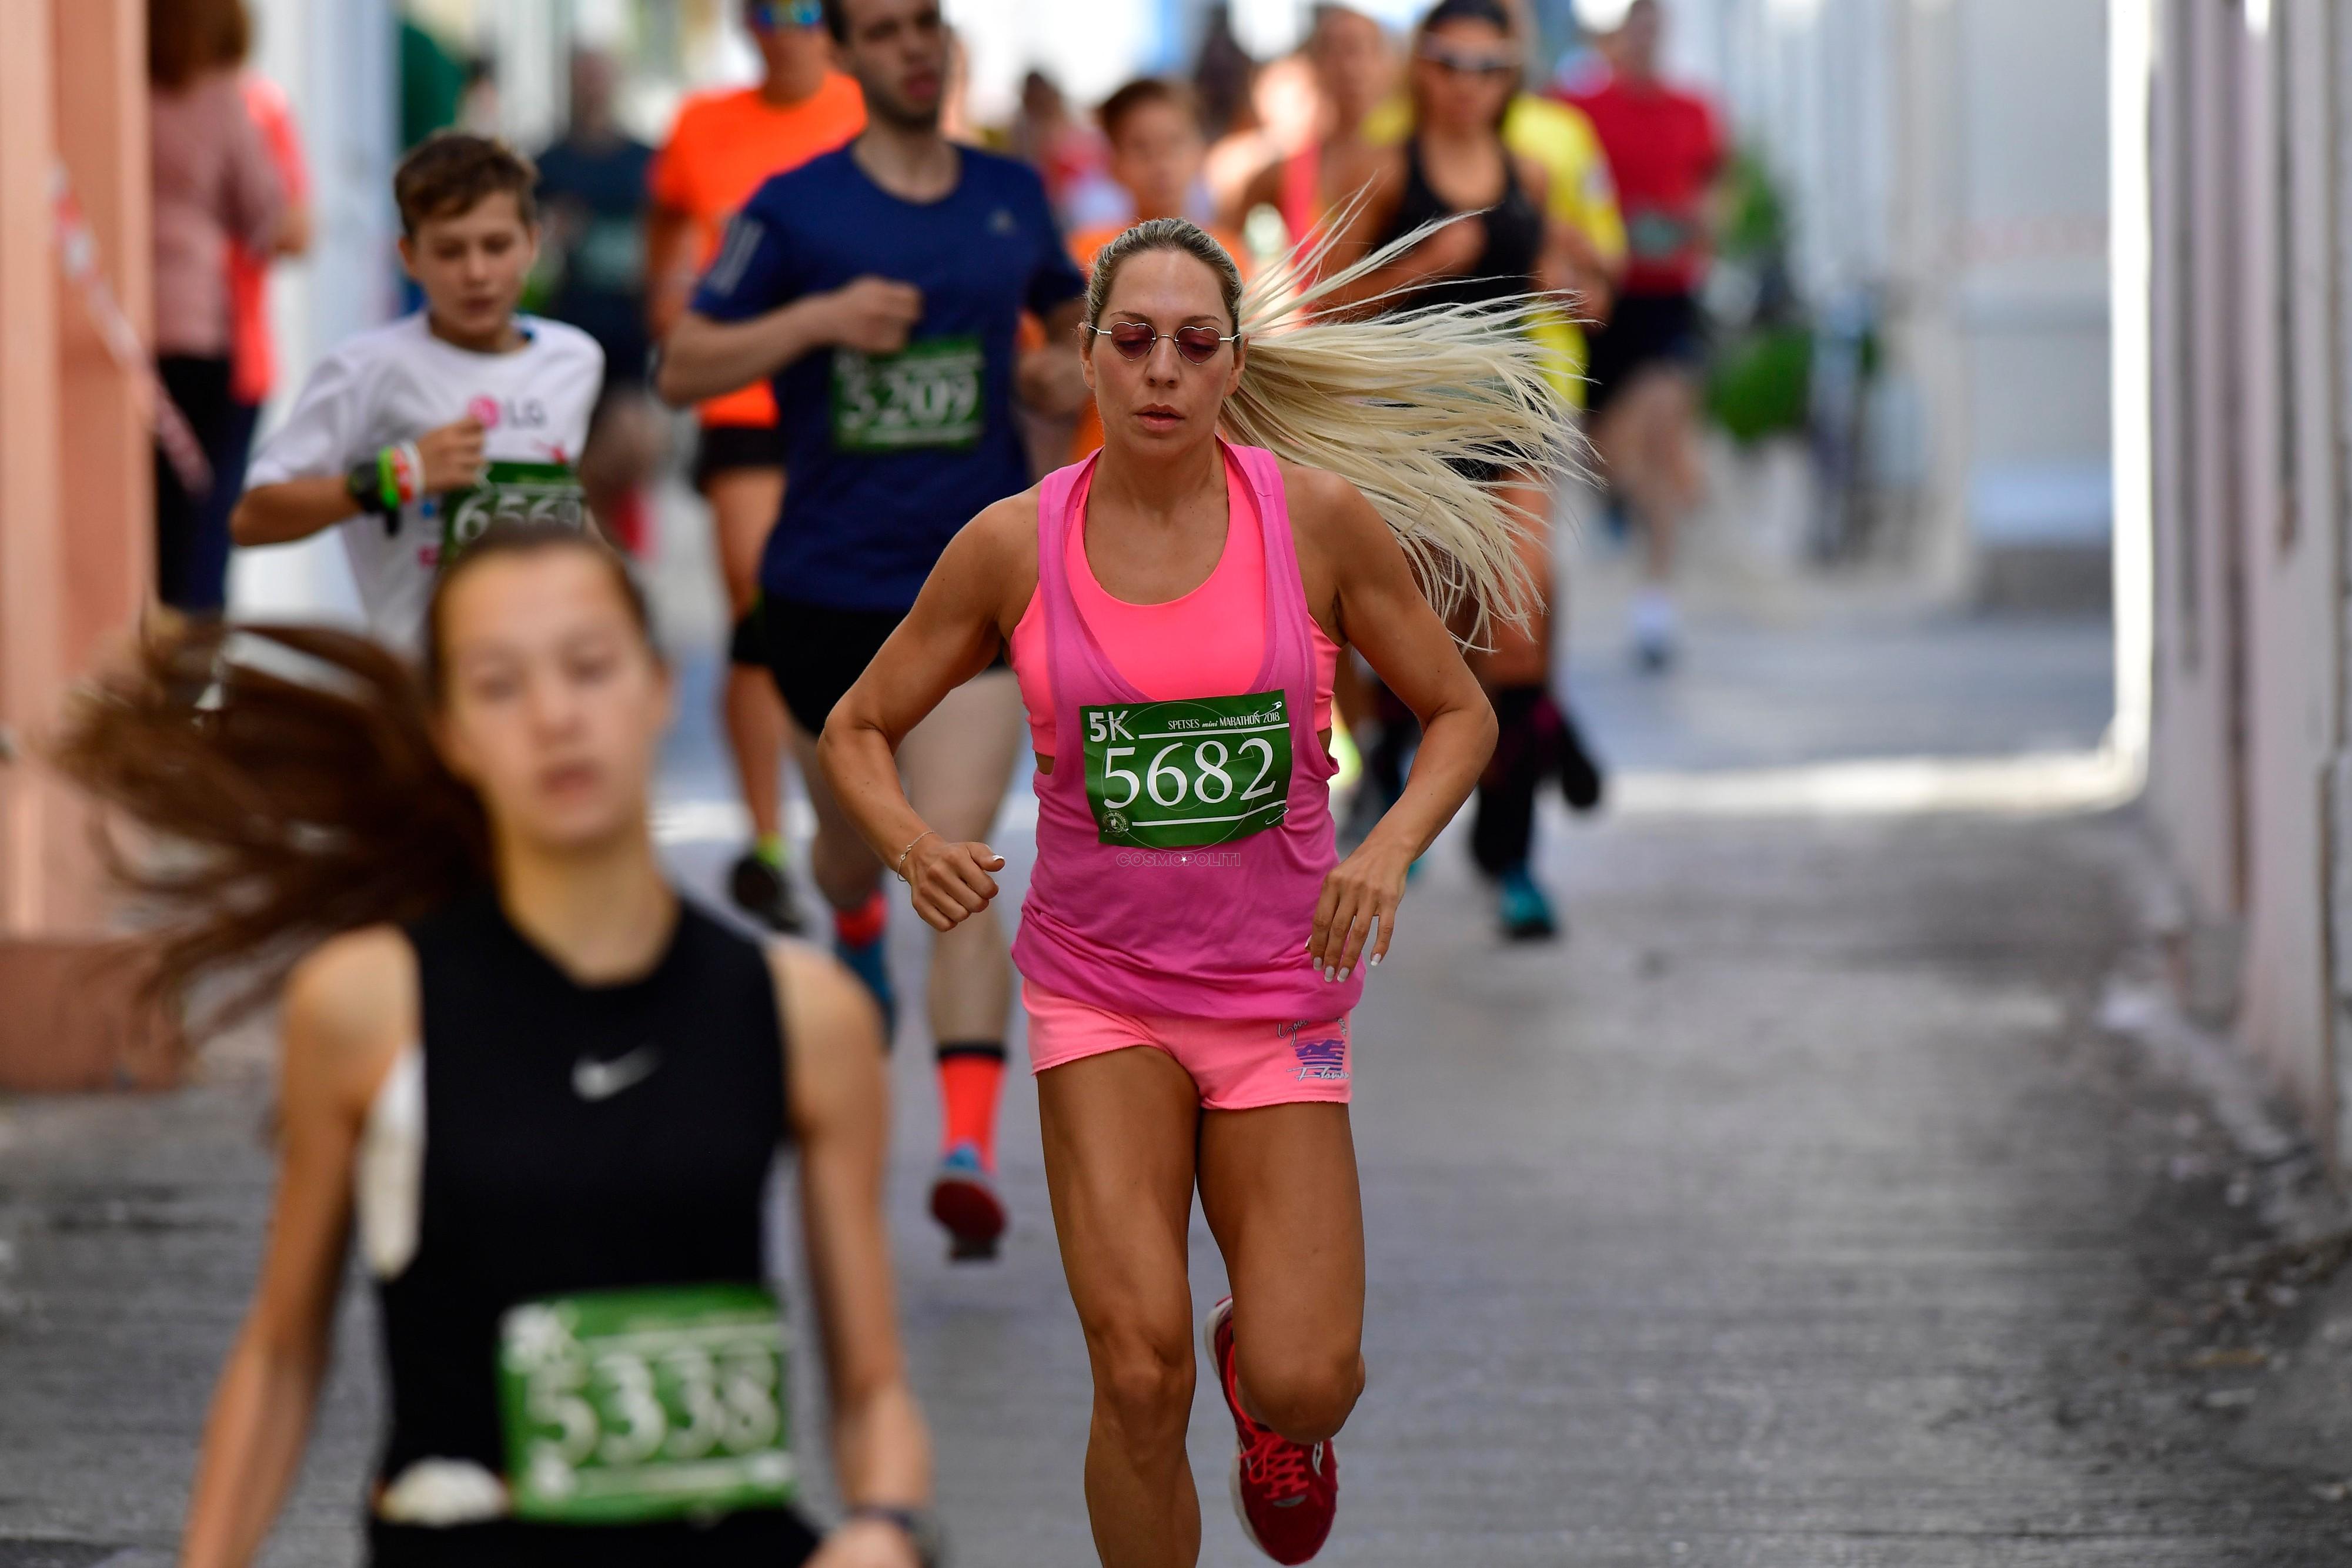 20181007_5km and 25km Runs_LP_01126